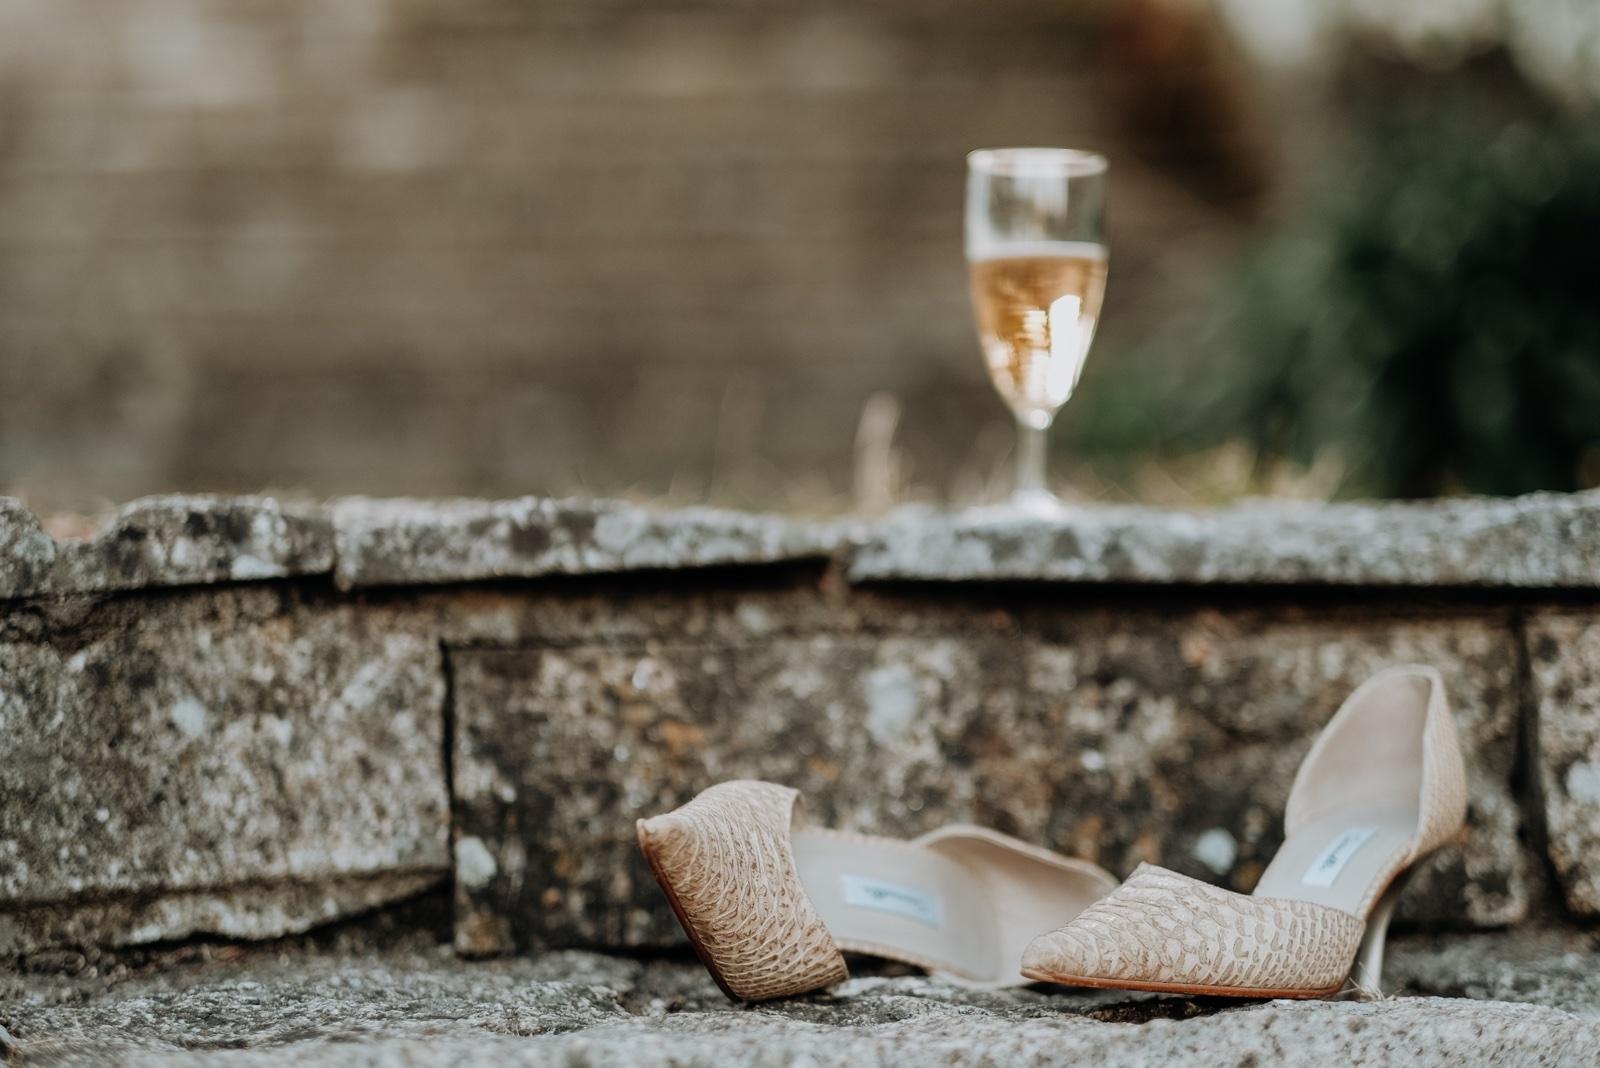 Fotografo de moda e calcado porto · sapatos Samelli